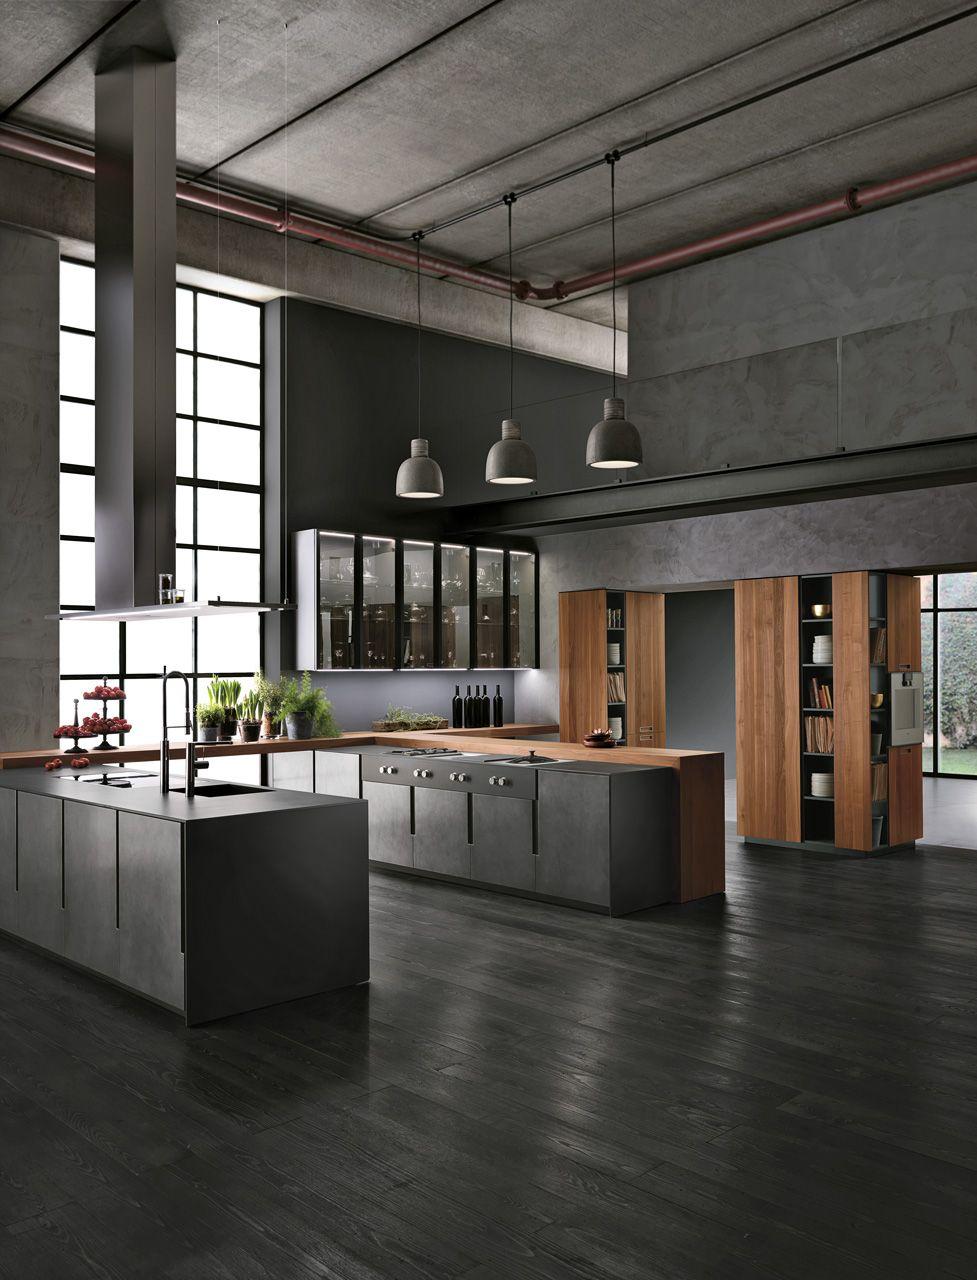 Vogue   Binova   Vogue   Pinterest   Kitchens, Lofts and Interiors